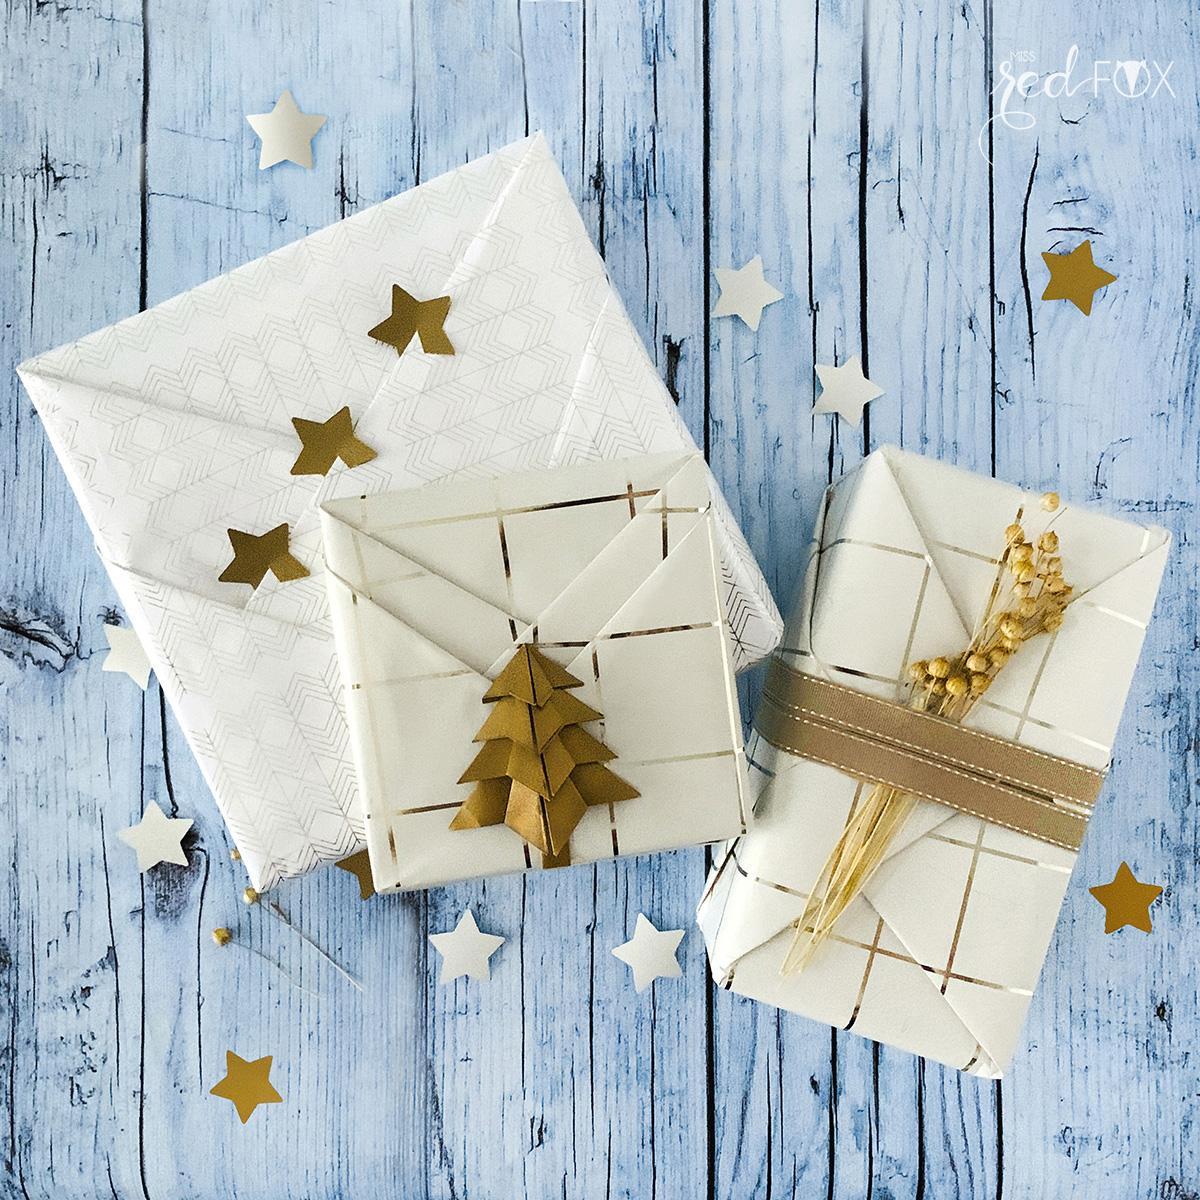 missredfox - 12giftswithlovegoesxmas - 24 - Japanisch inspirierte Geschenkverpackung 1